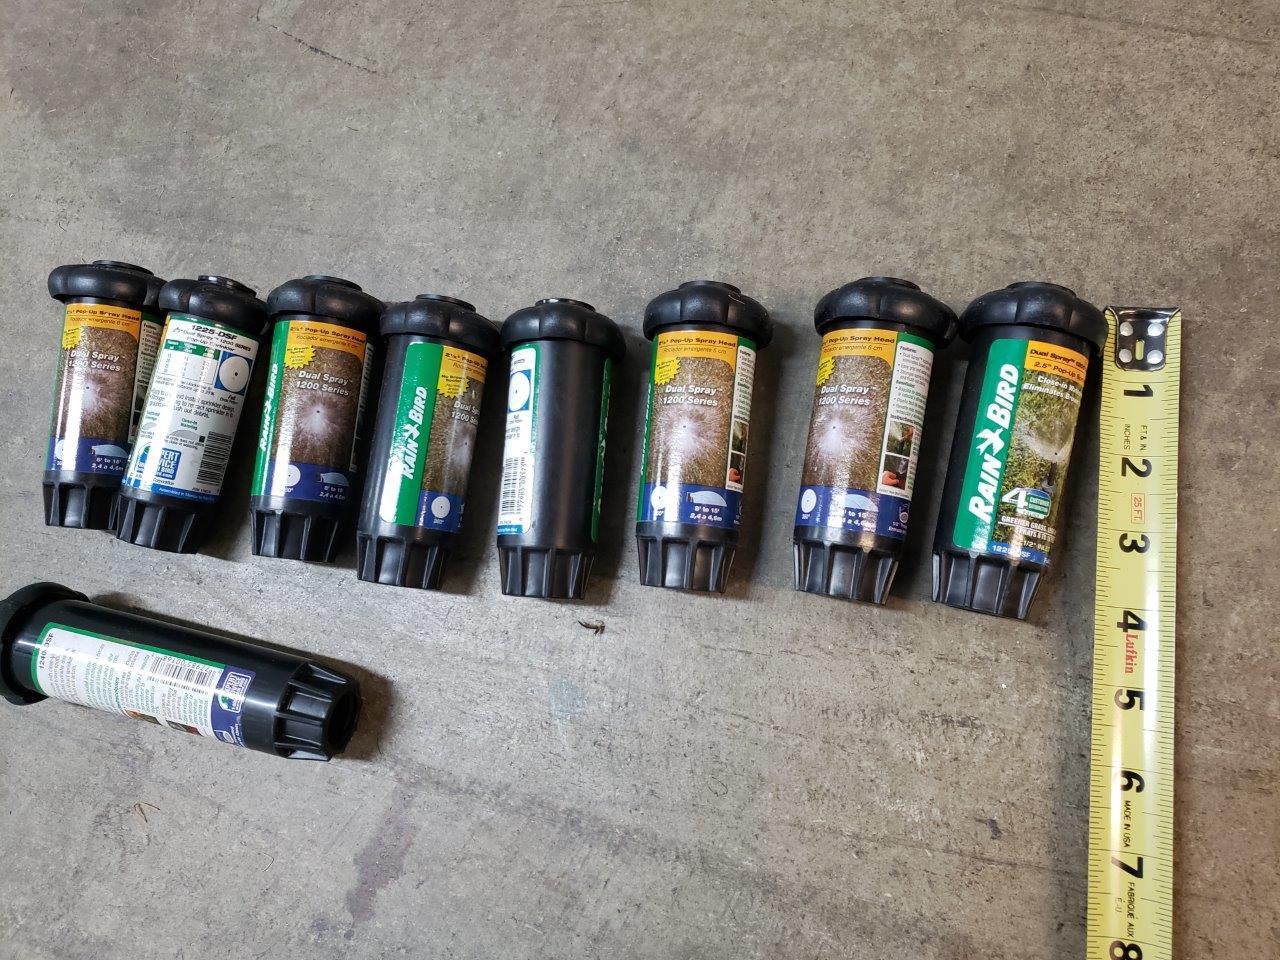 "Rain Bird 8x 1225-DSF and 1x 1240-DSF  2.5"" Dual Spray Pop-Up Sprinkler Head (Full Circle Pattern) sprinklers"